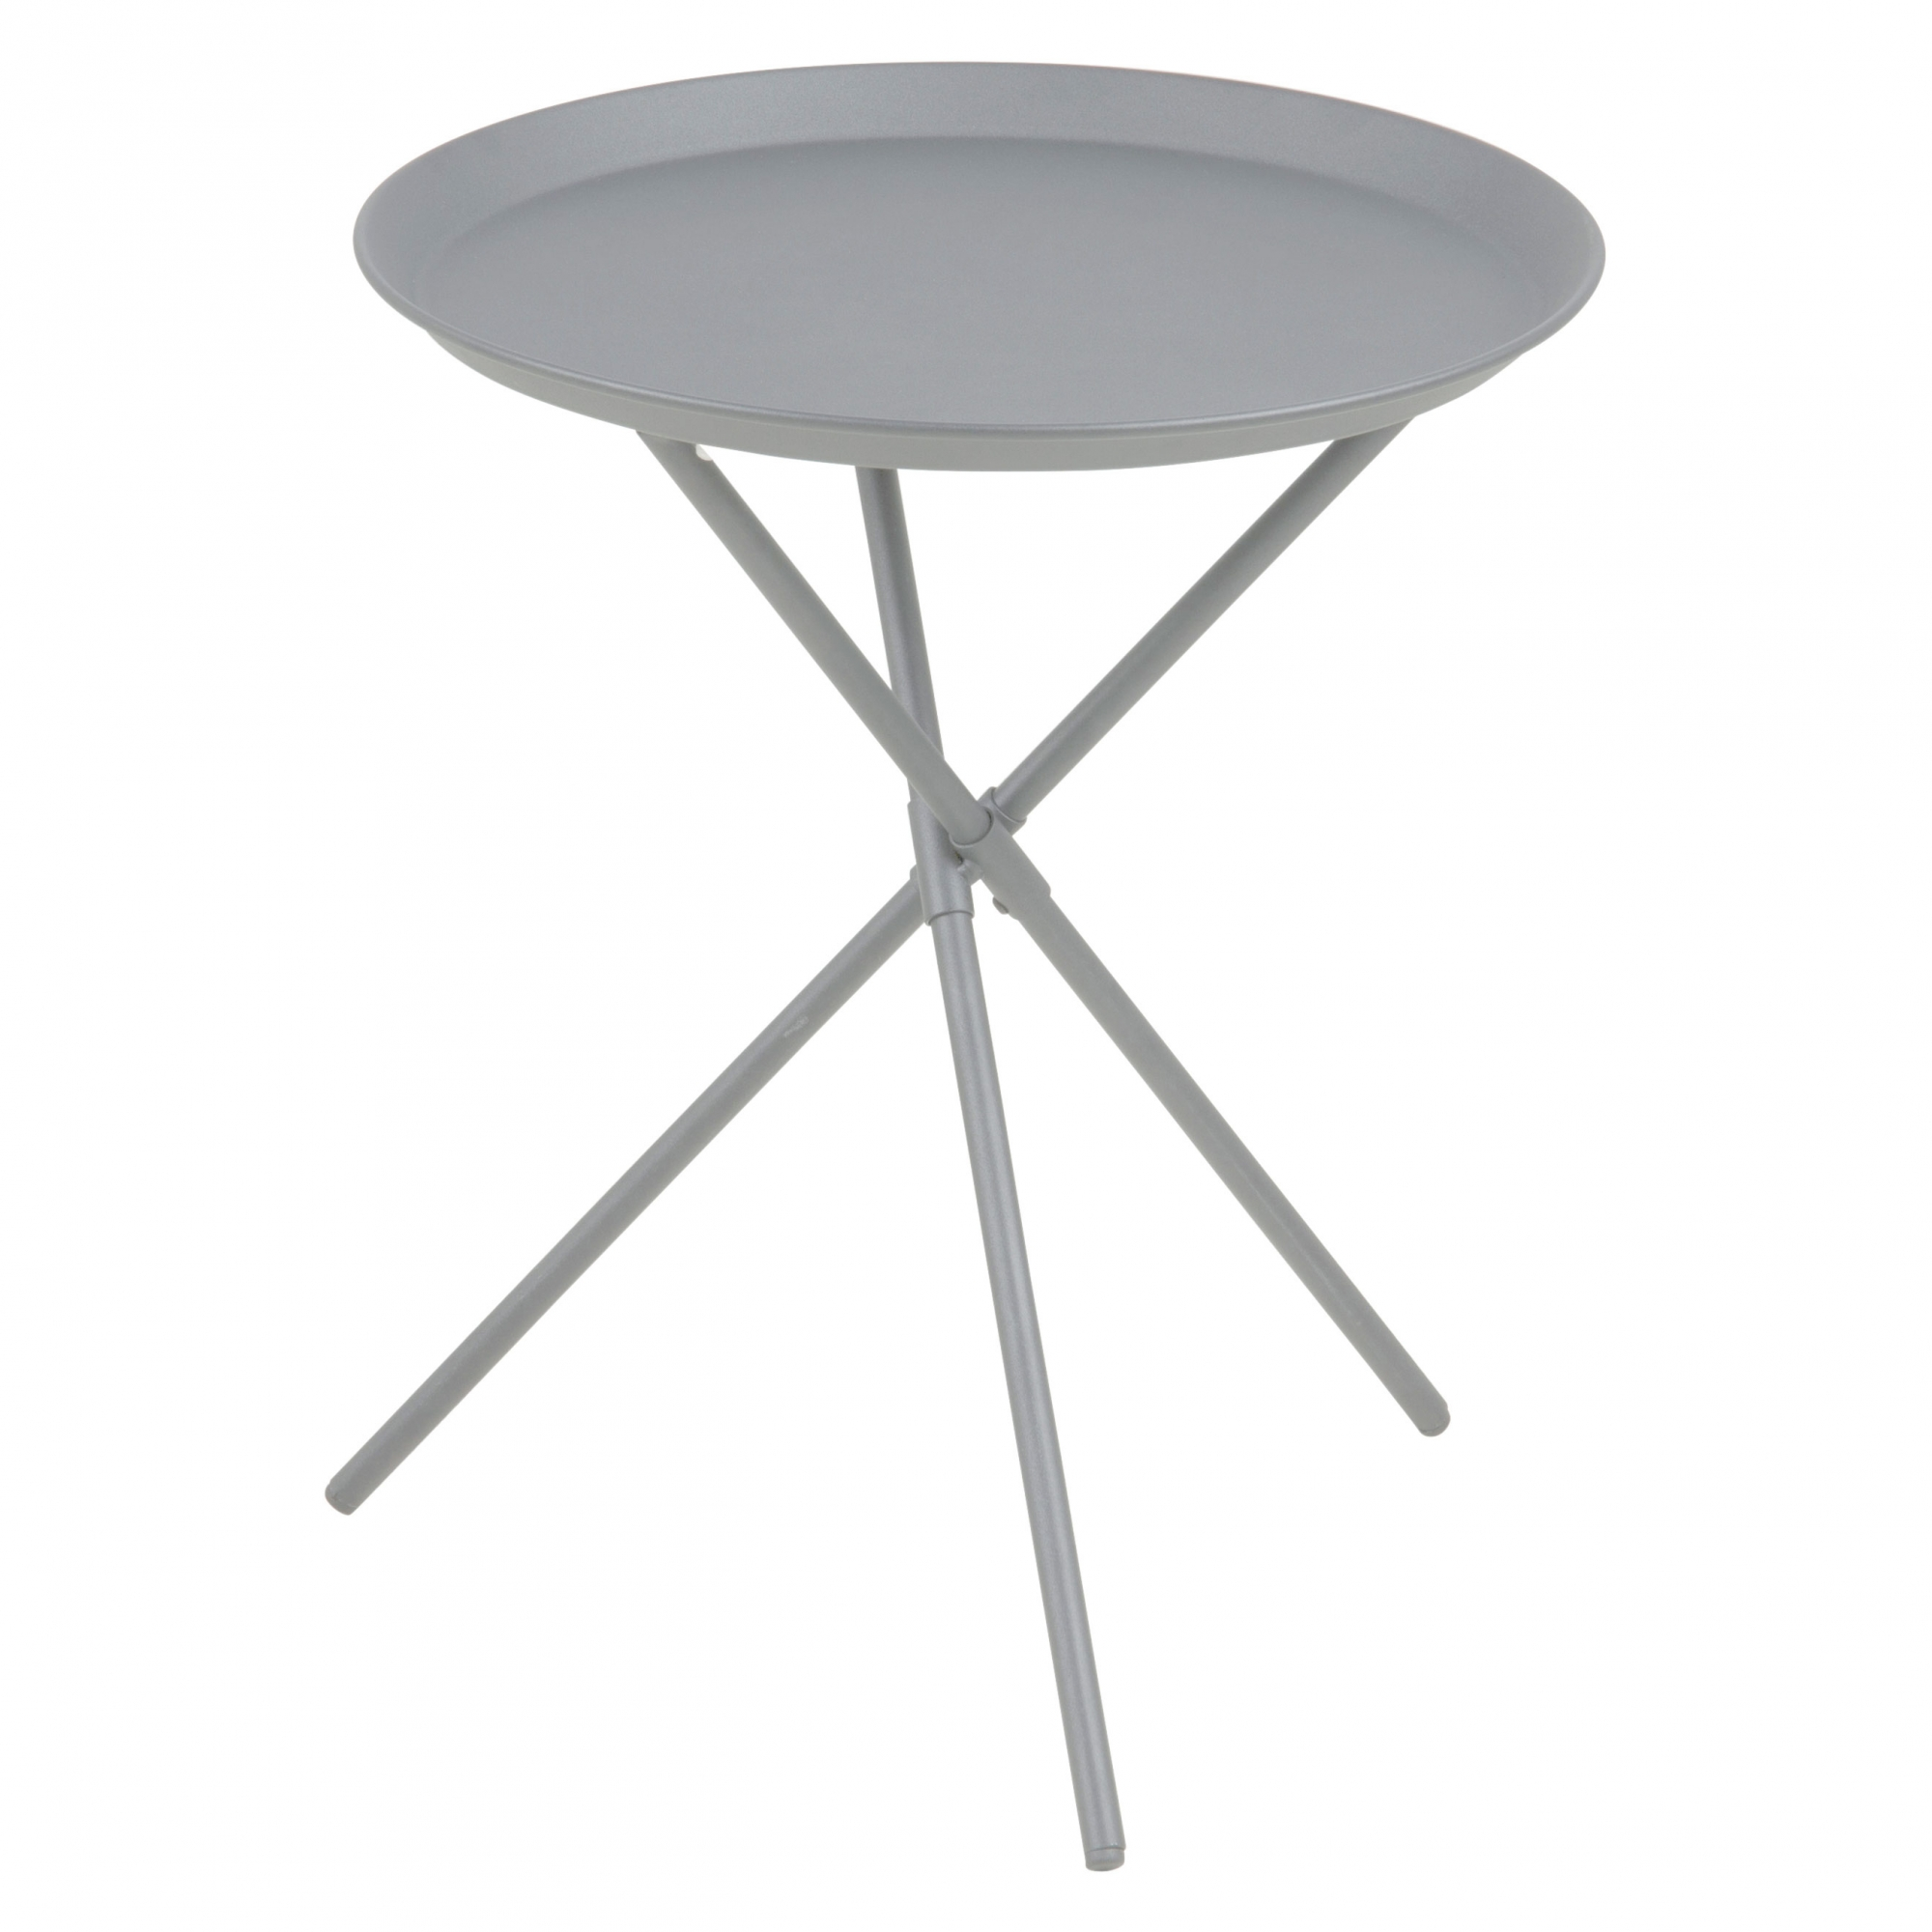 Odkladací / nočný stolík Triple, 39 cm, sivá, šedá